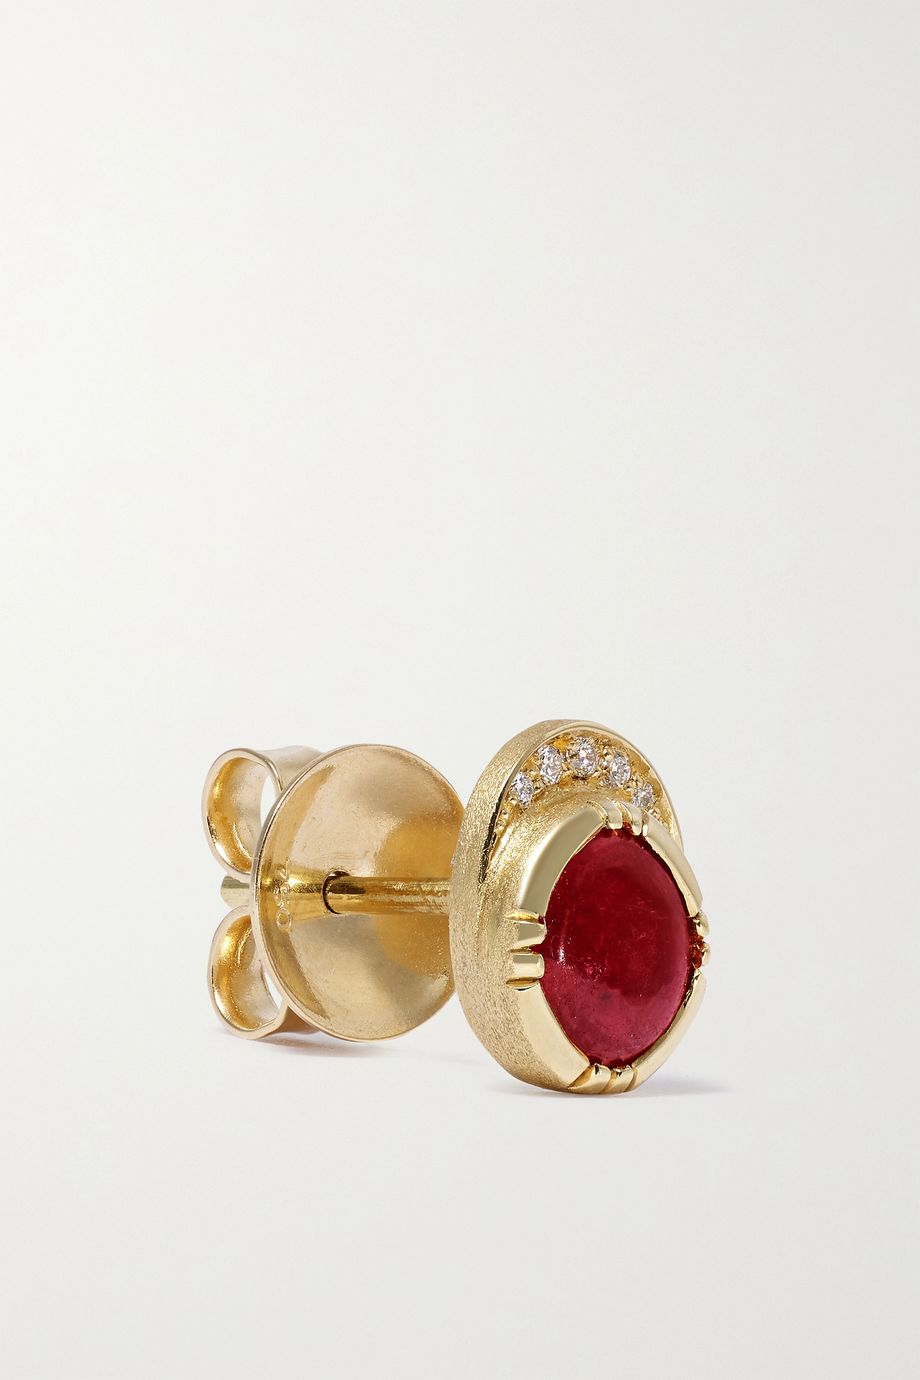 Brooke Gregson Orbit Halo 18-karat gold, ruby and diamond earrings